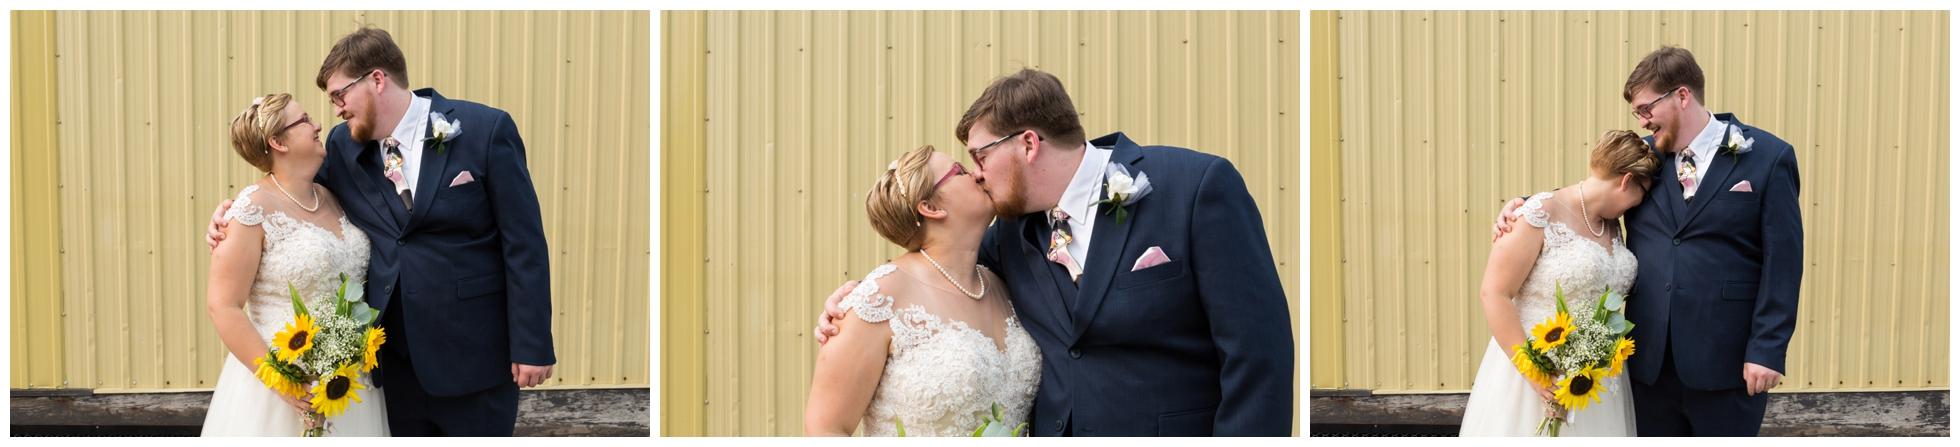 Toronto Wedding Chris Kate (Selena Phillips-Boyle)_0020.jpg